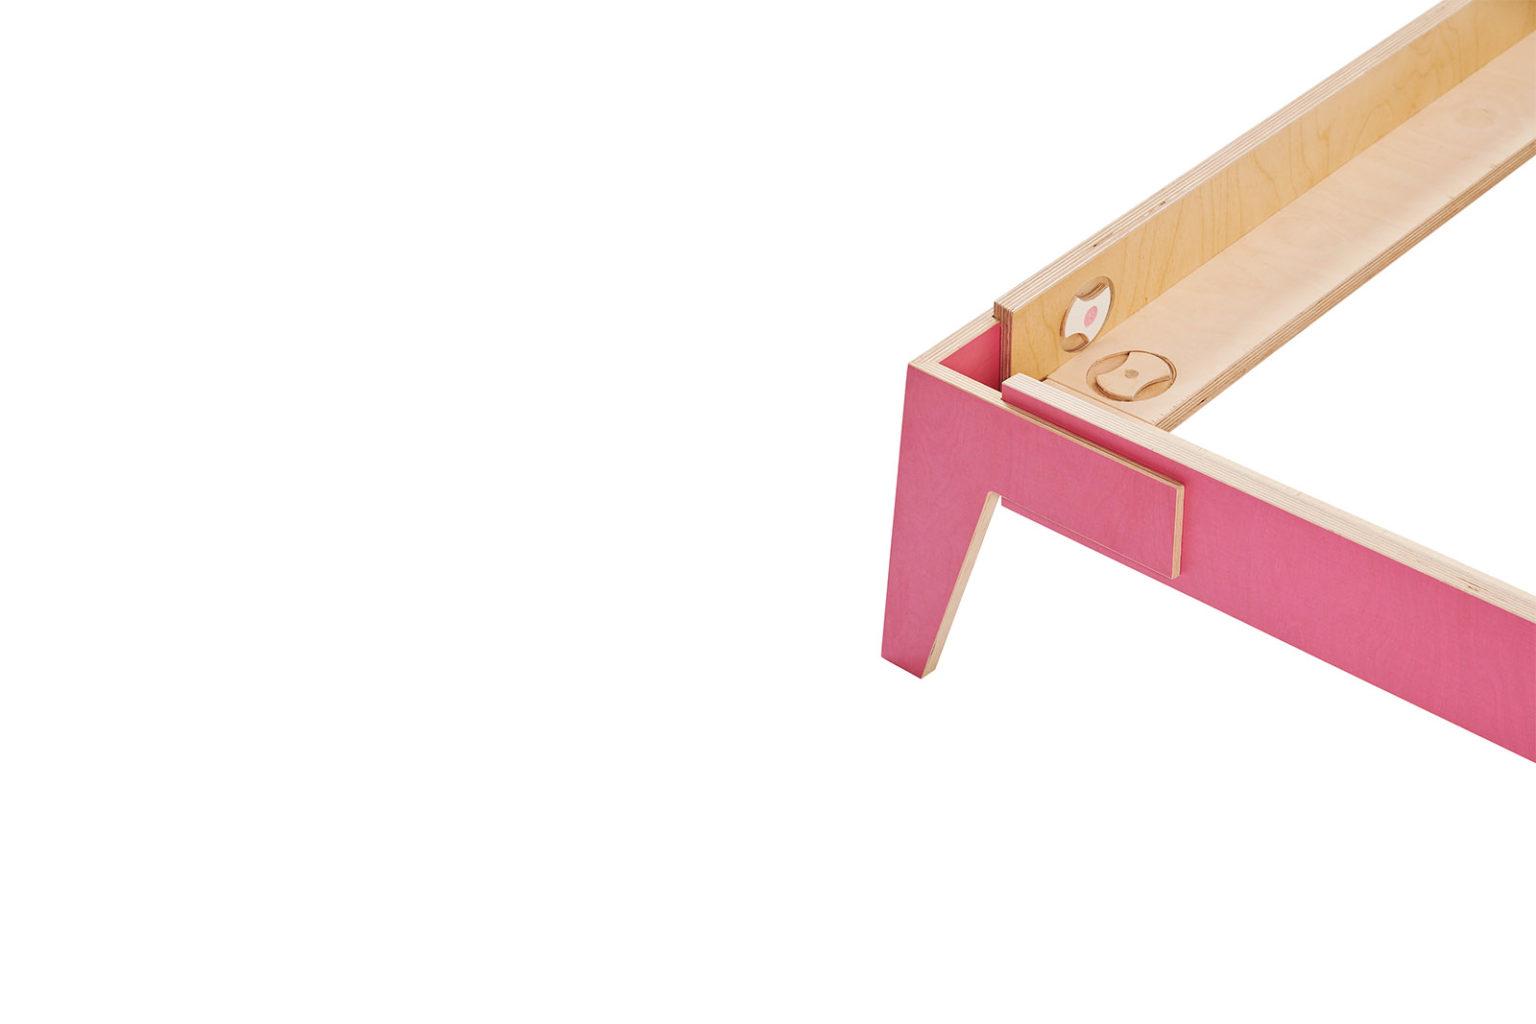 _0004_4.14 pink Shift Bed_c